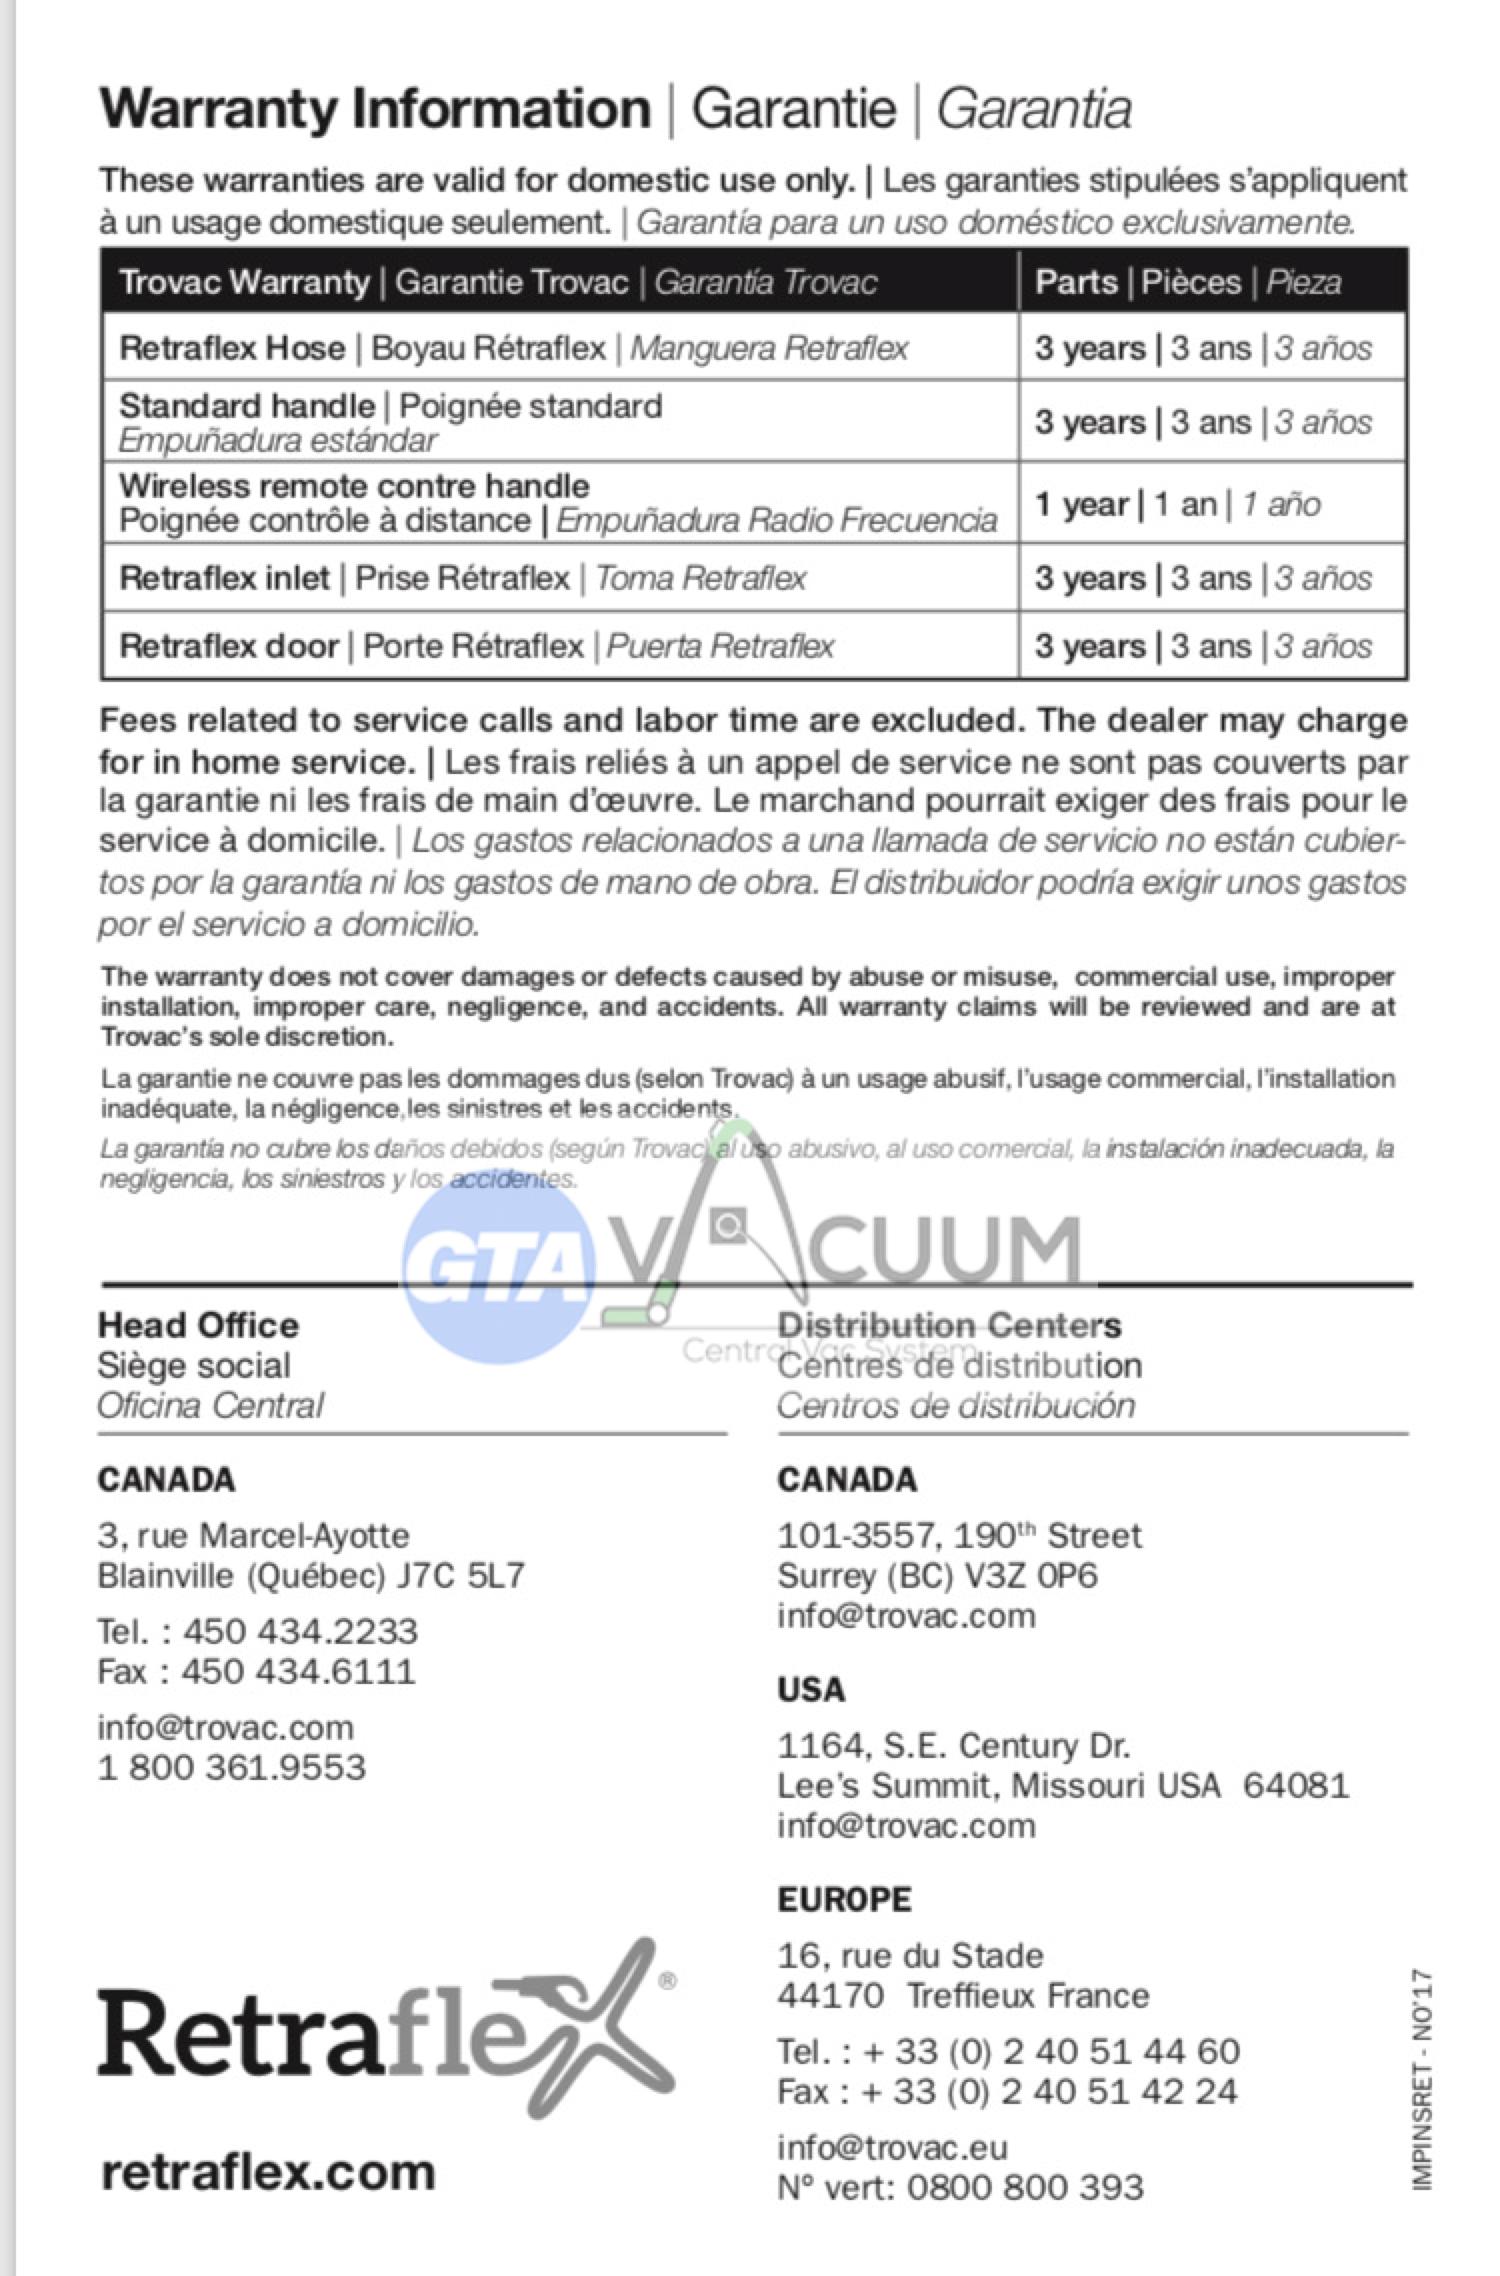 Retraflex Warranty